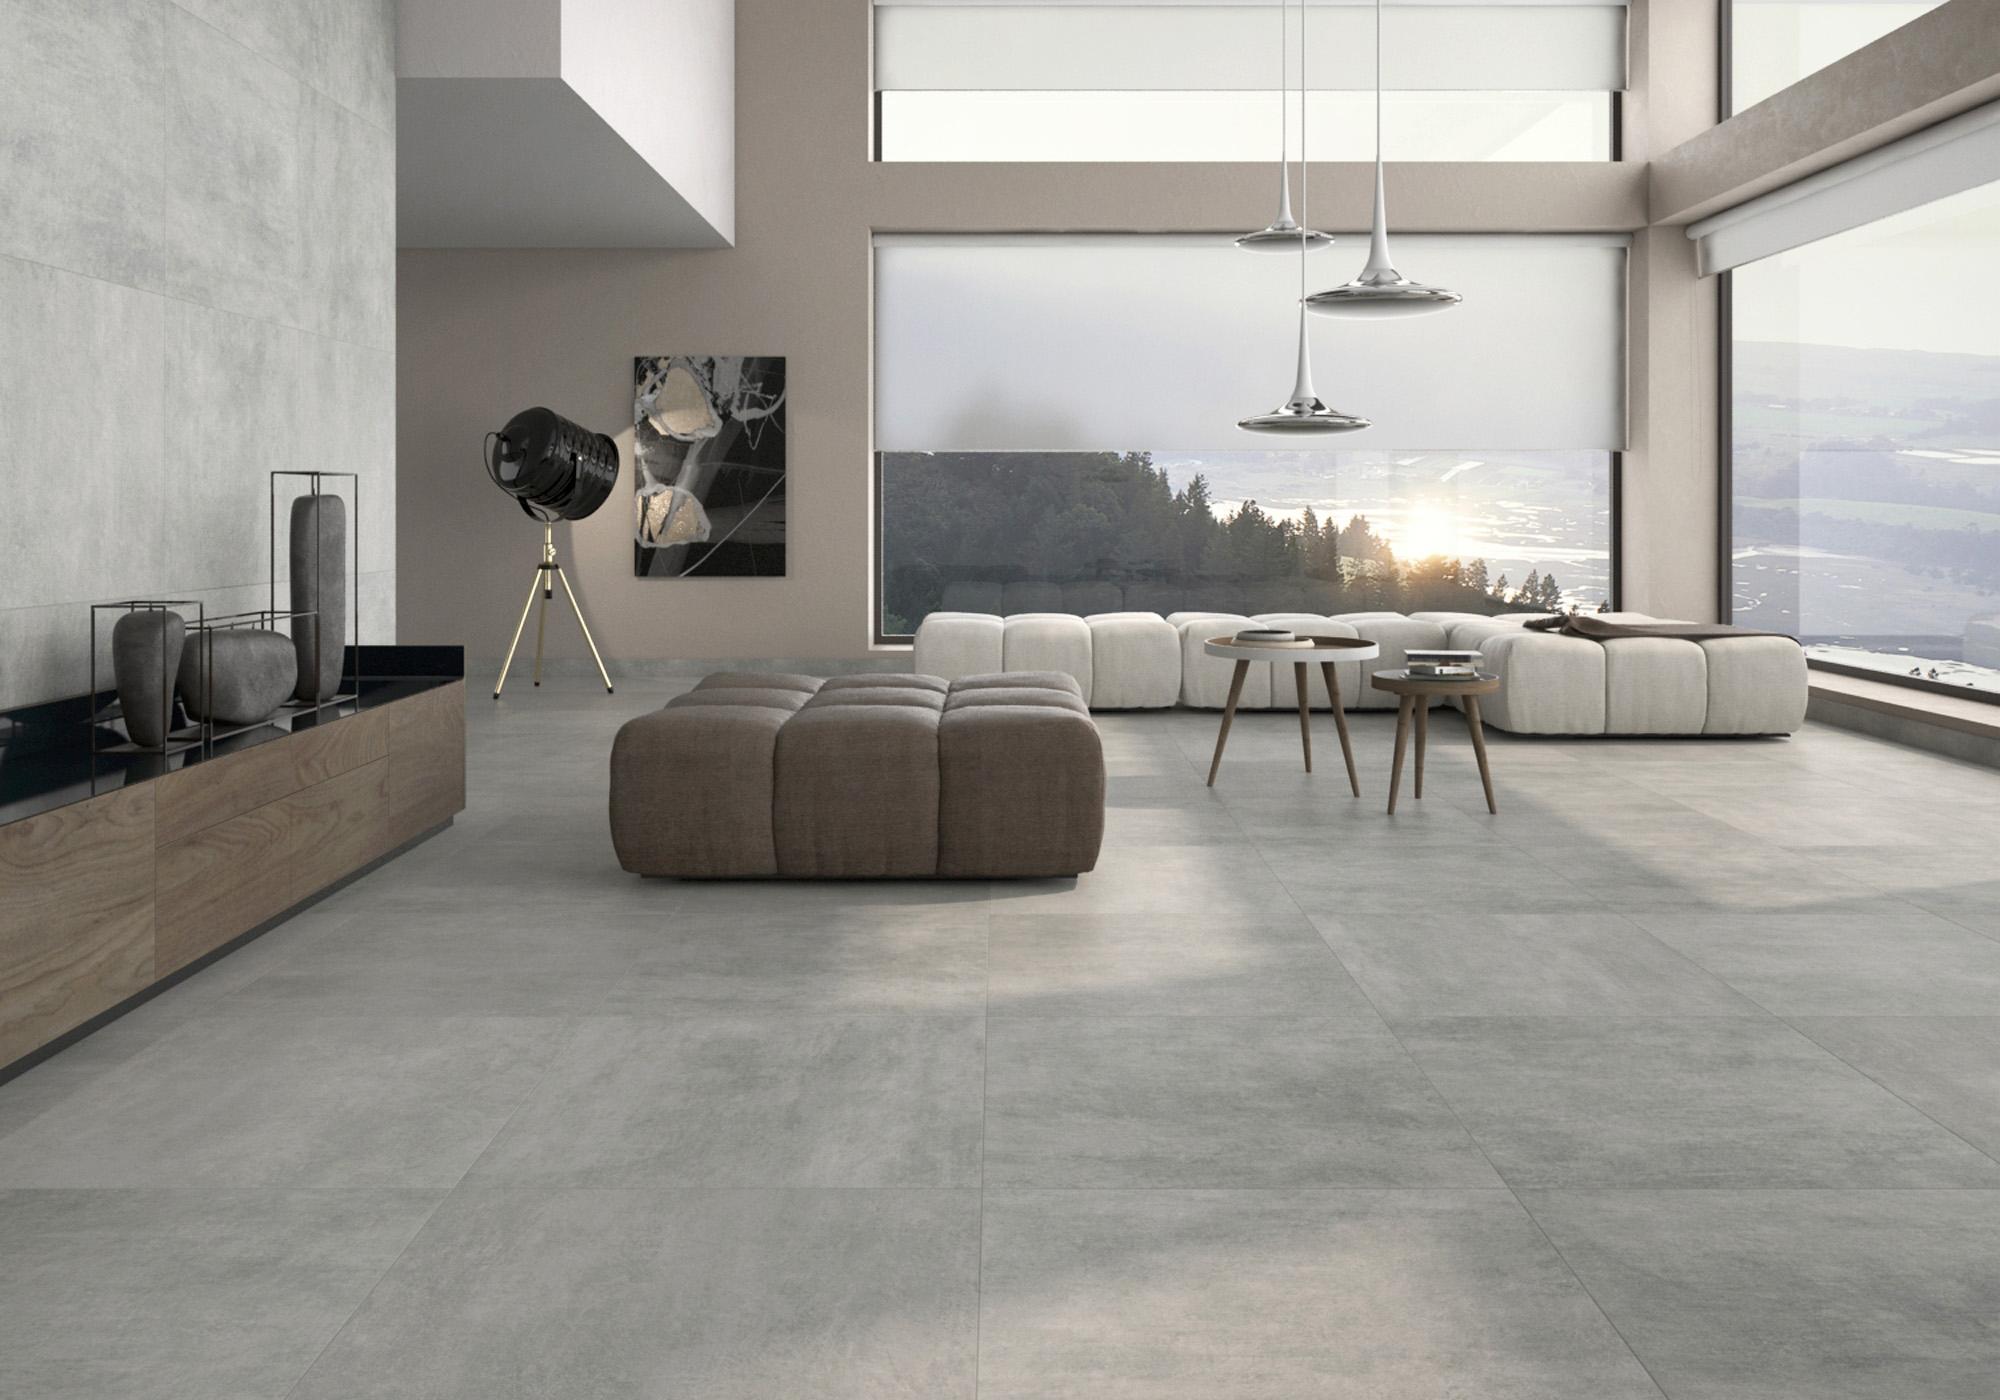 fliesen linnenbecker gmbh holzhandel fliesenhandel baustoffhandel. Black Bedroom Furniture Sets. Home Design Ideas